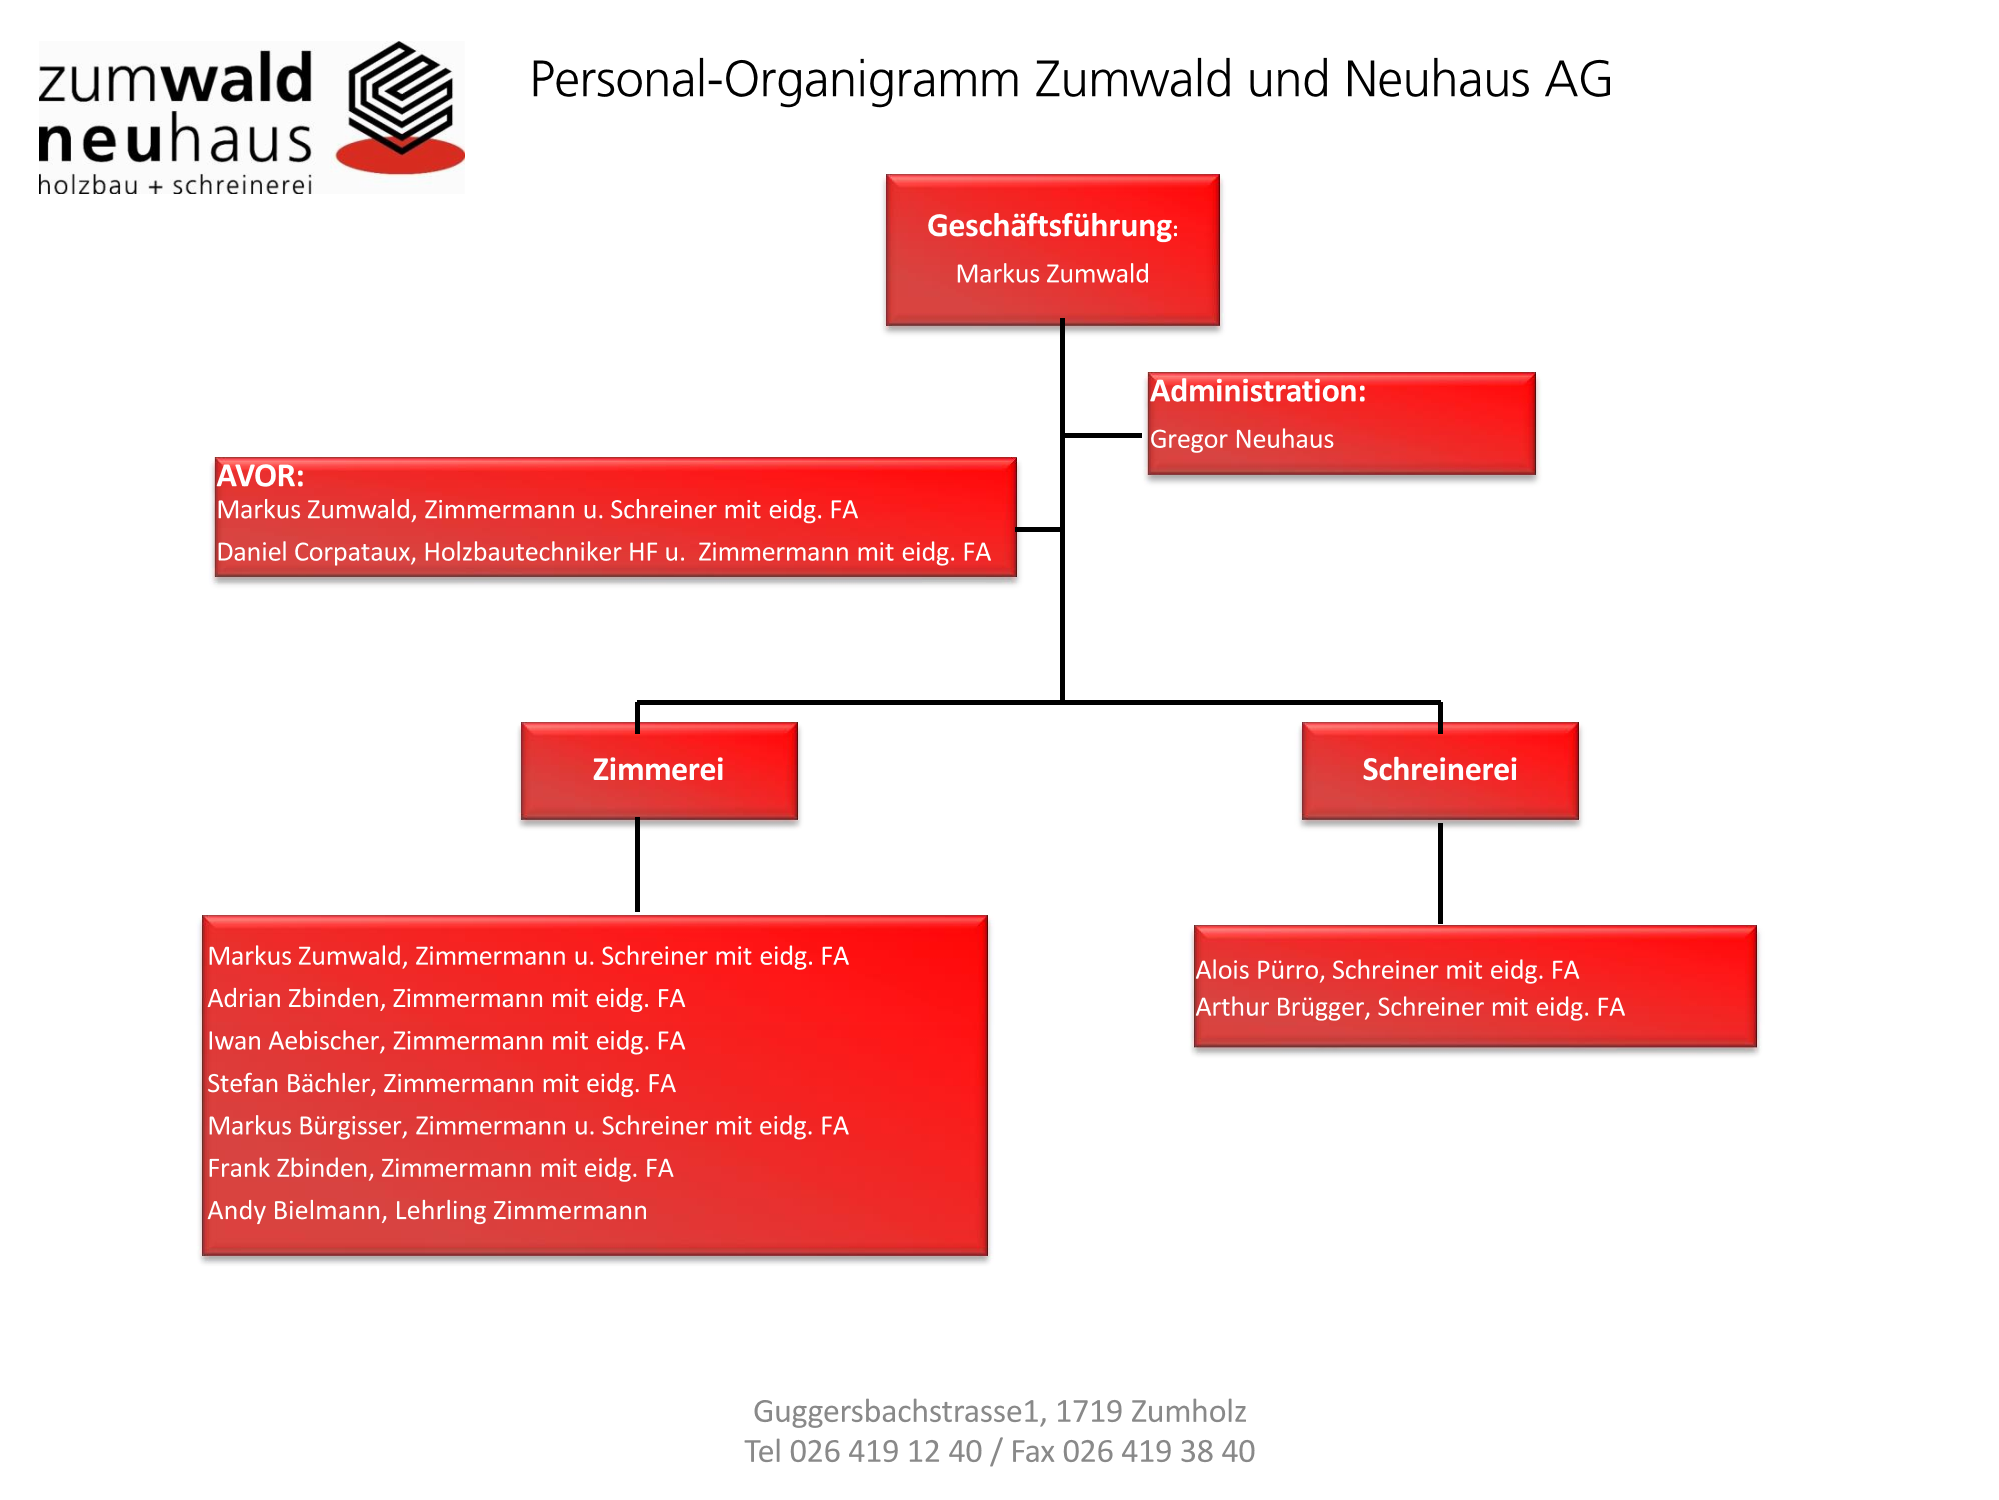 Organigramm Personal